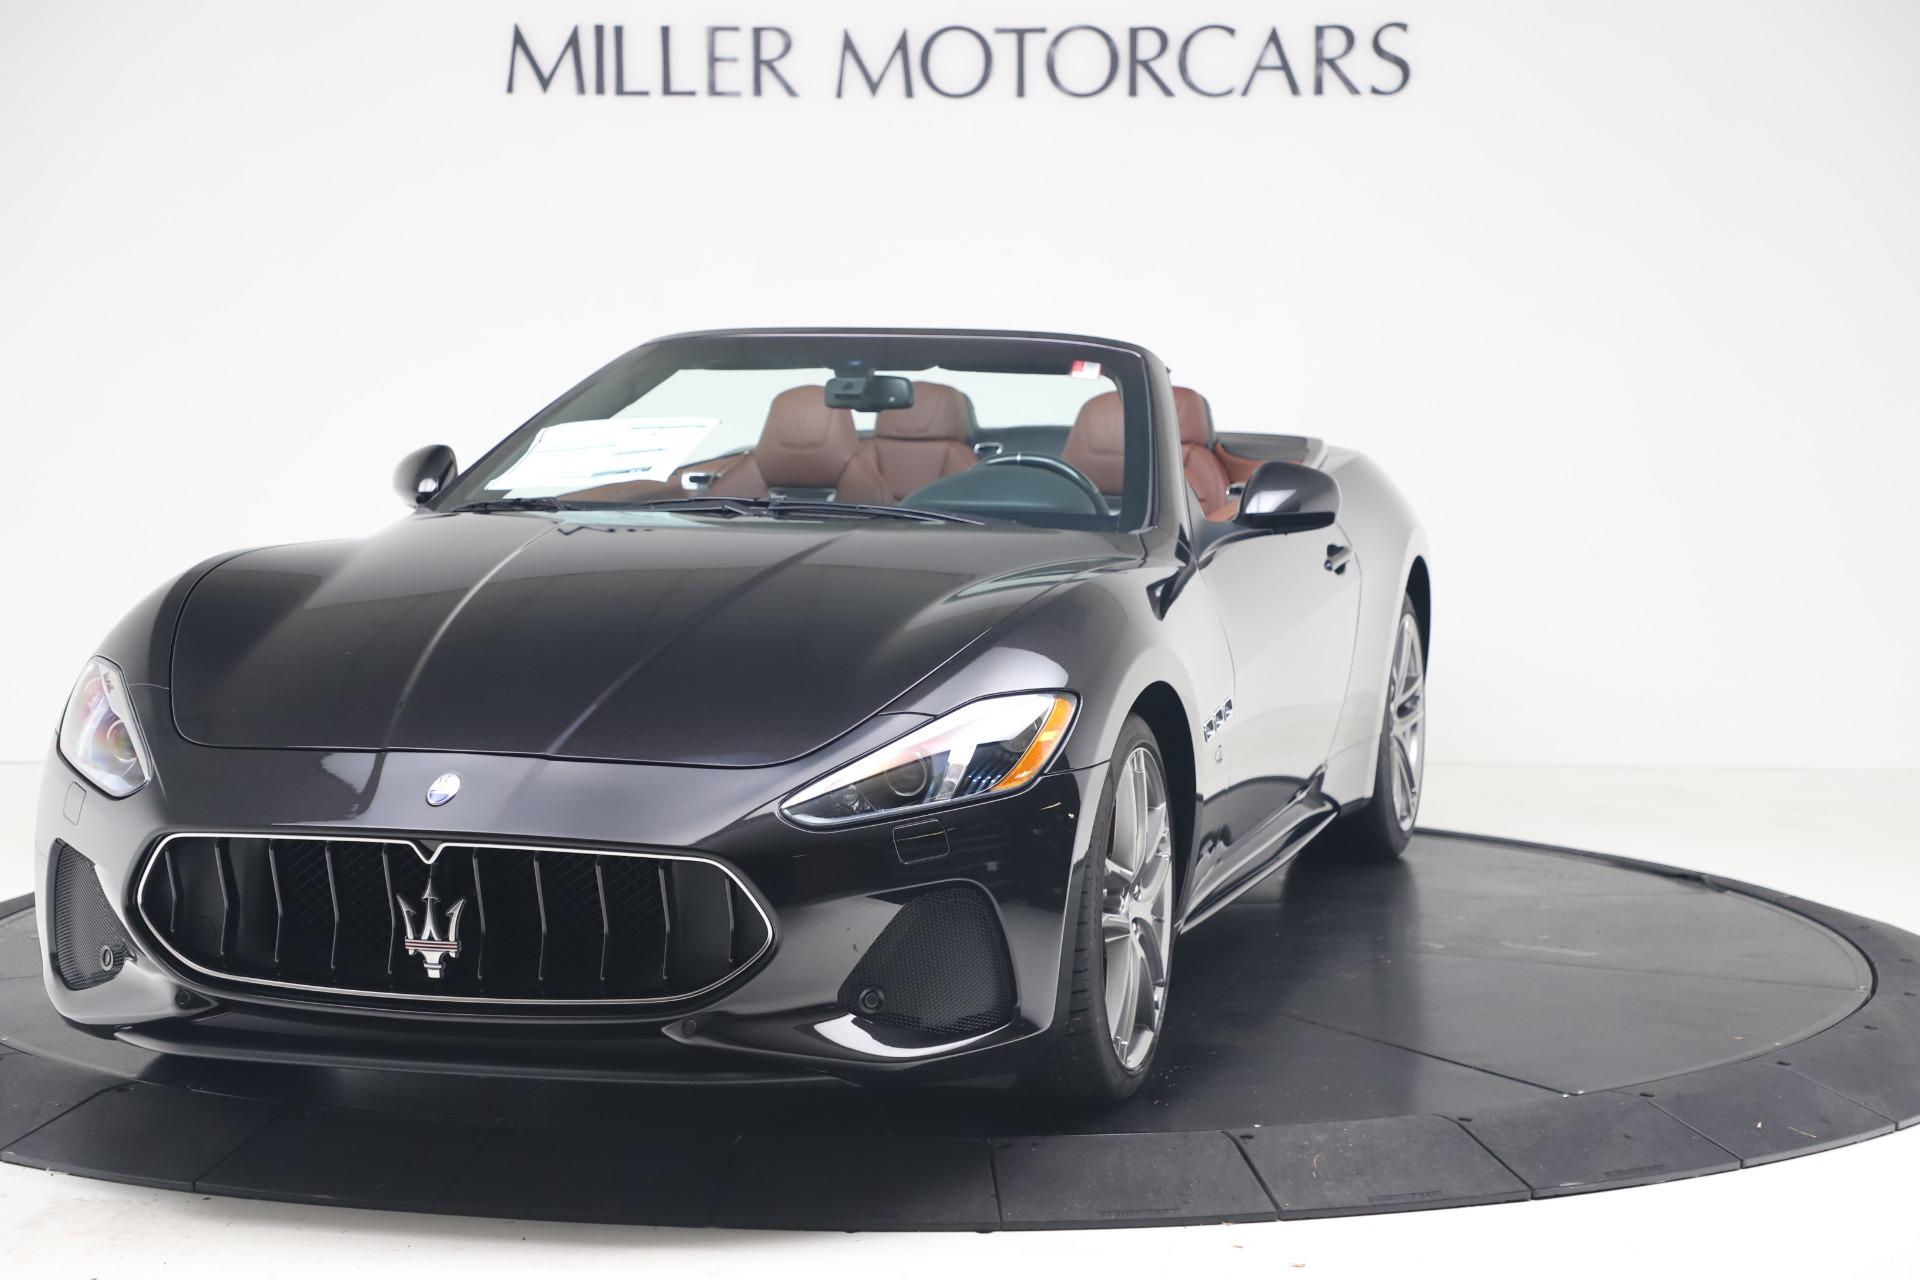 New 2019 Maserati GranTurismo Sport Convertible for sale $165,645 at Bentley Greenwich in Greenwich CT 06830 1